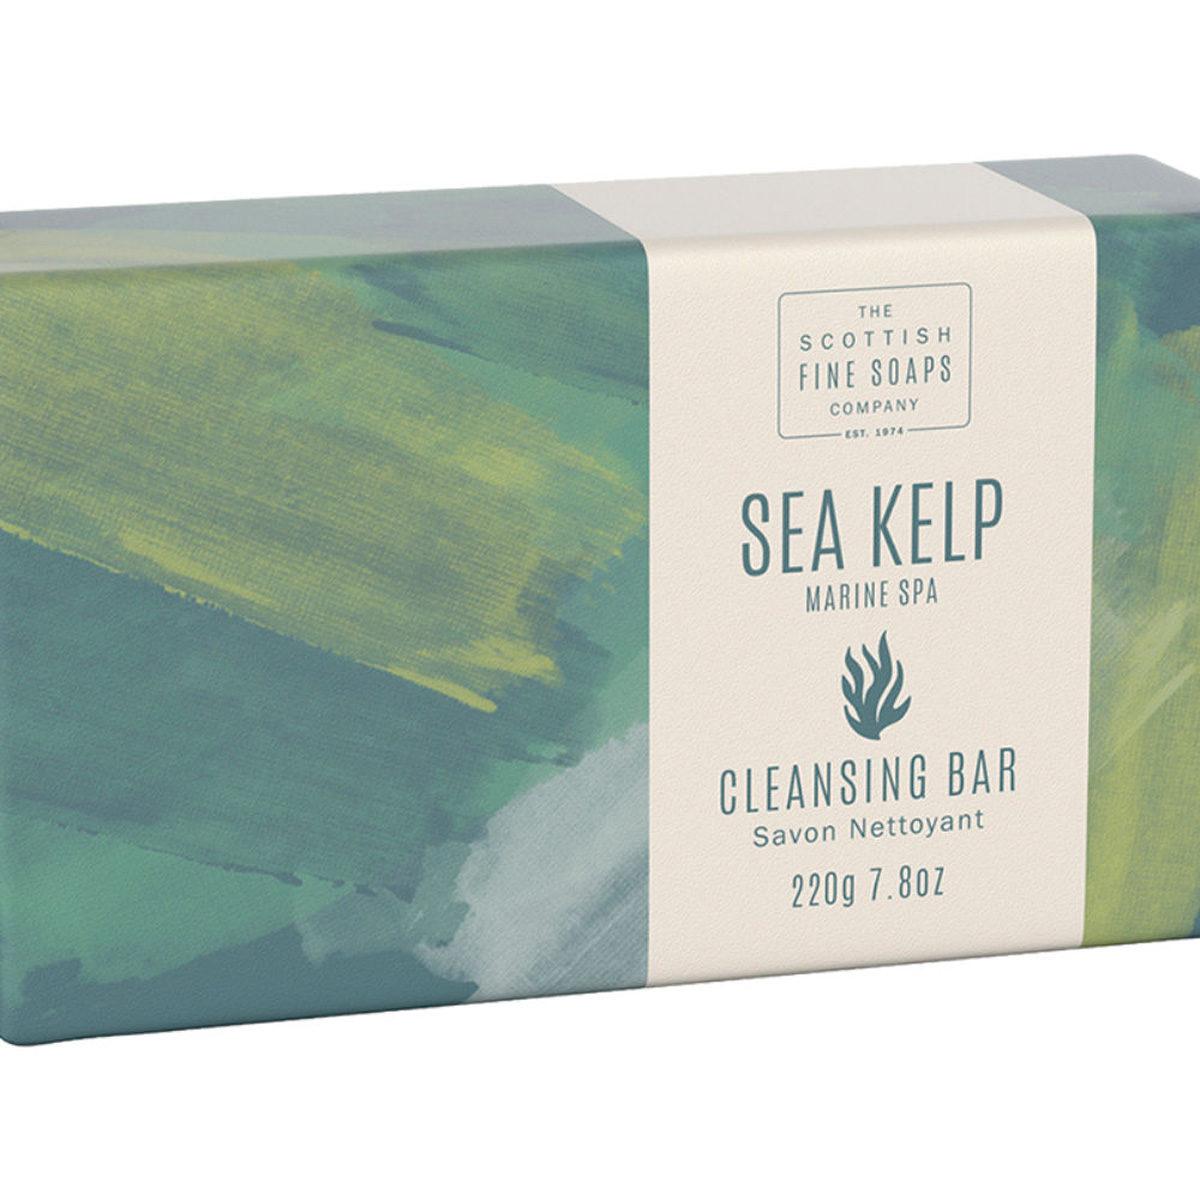 Sea Kelp Marine Spa Cleansing Bar